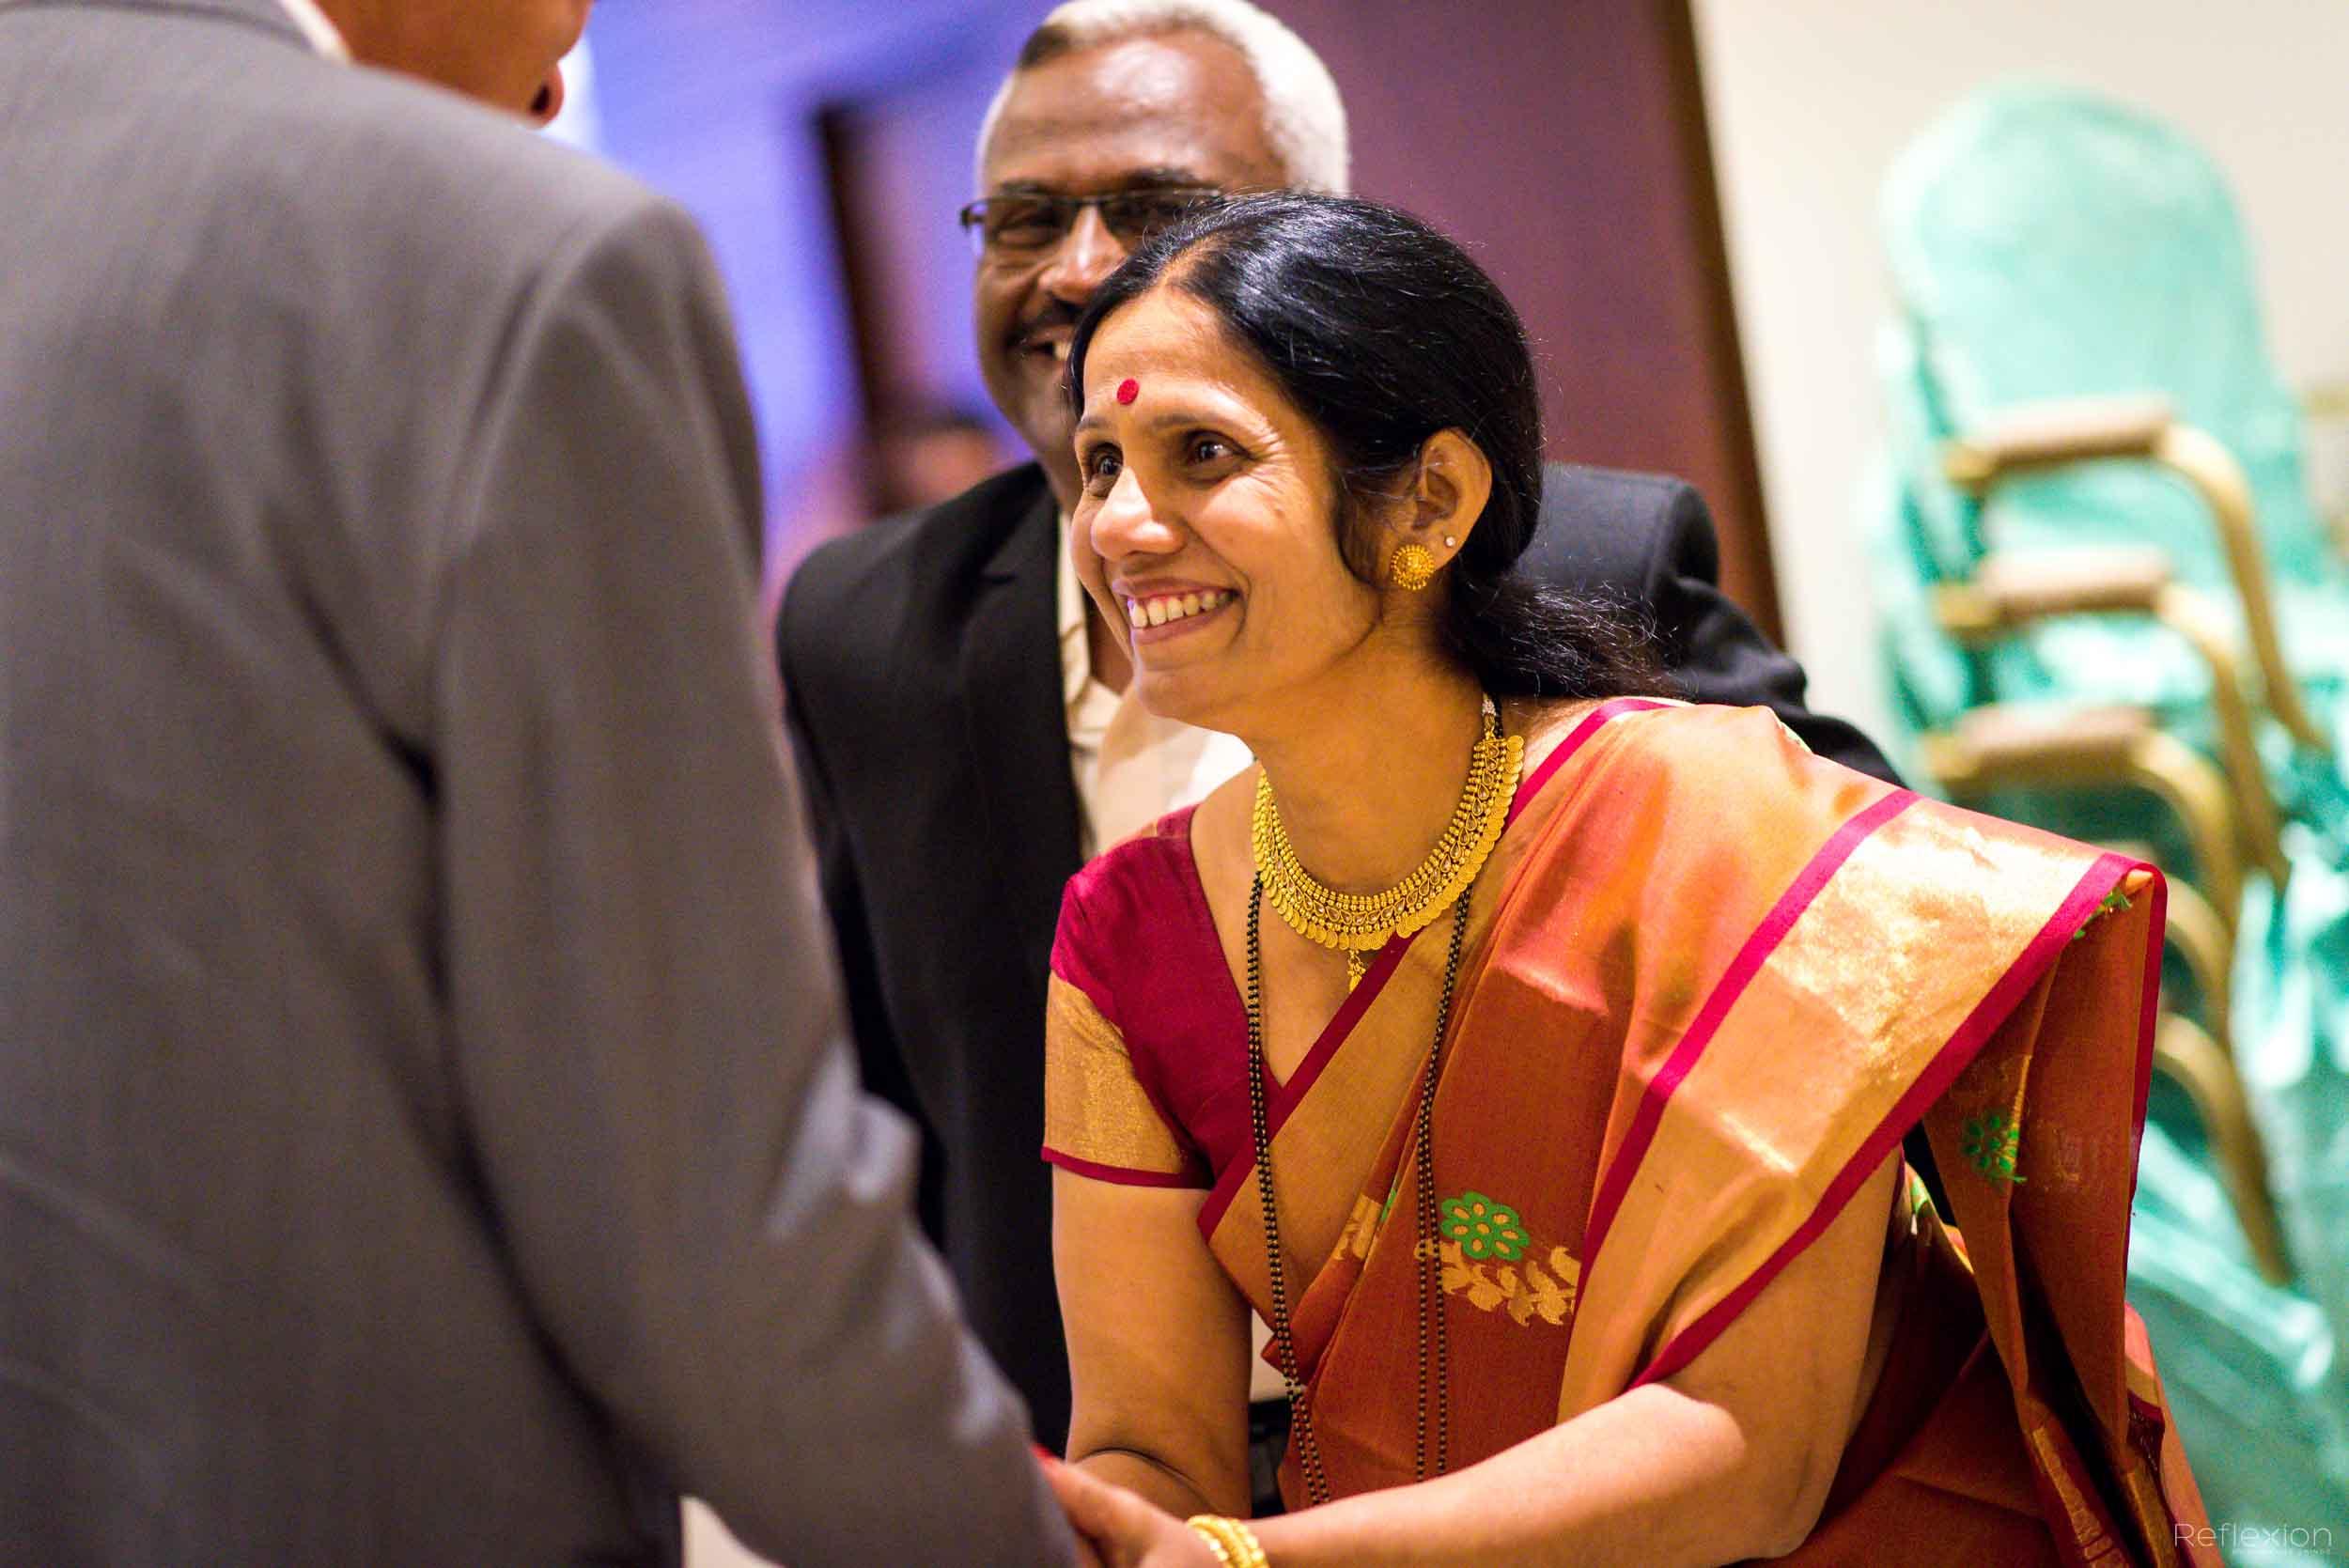 american-indian-wedding-41.jpg